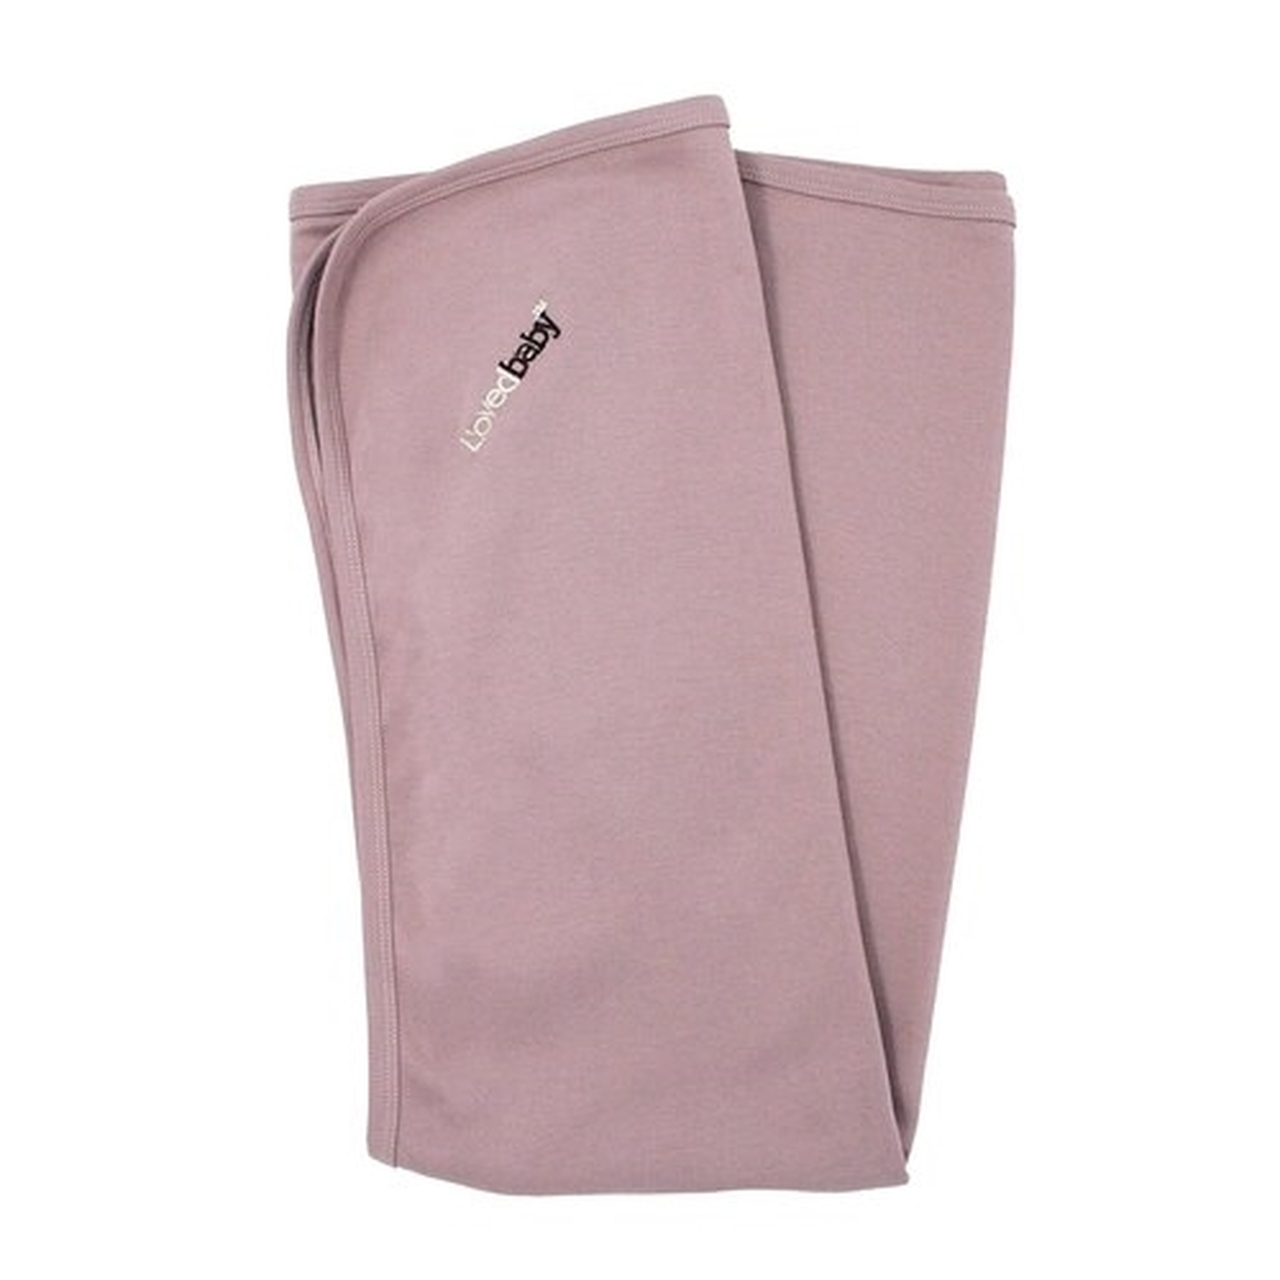 Organic Baby Blanket - Mauve